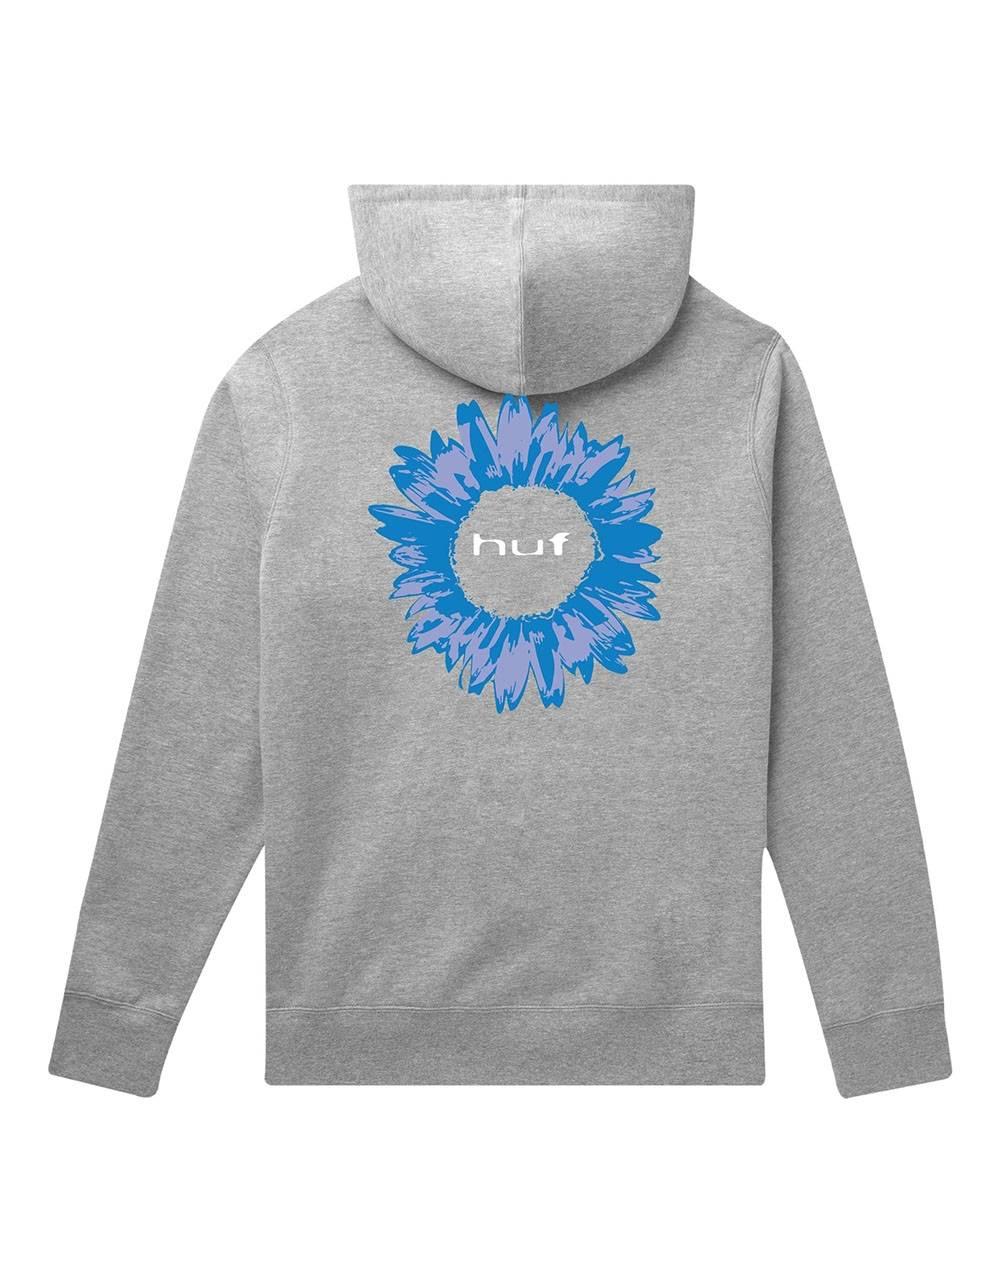 Huf Peaking P/O hoodie - grey heather Huf Sweater 112,00€